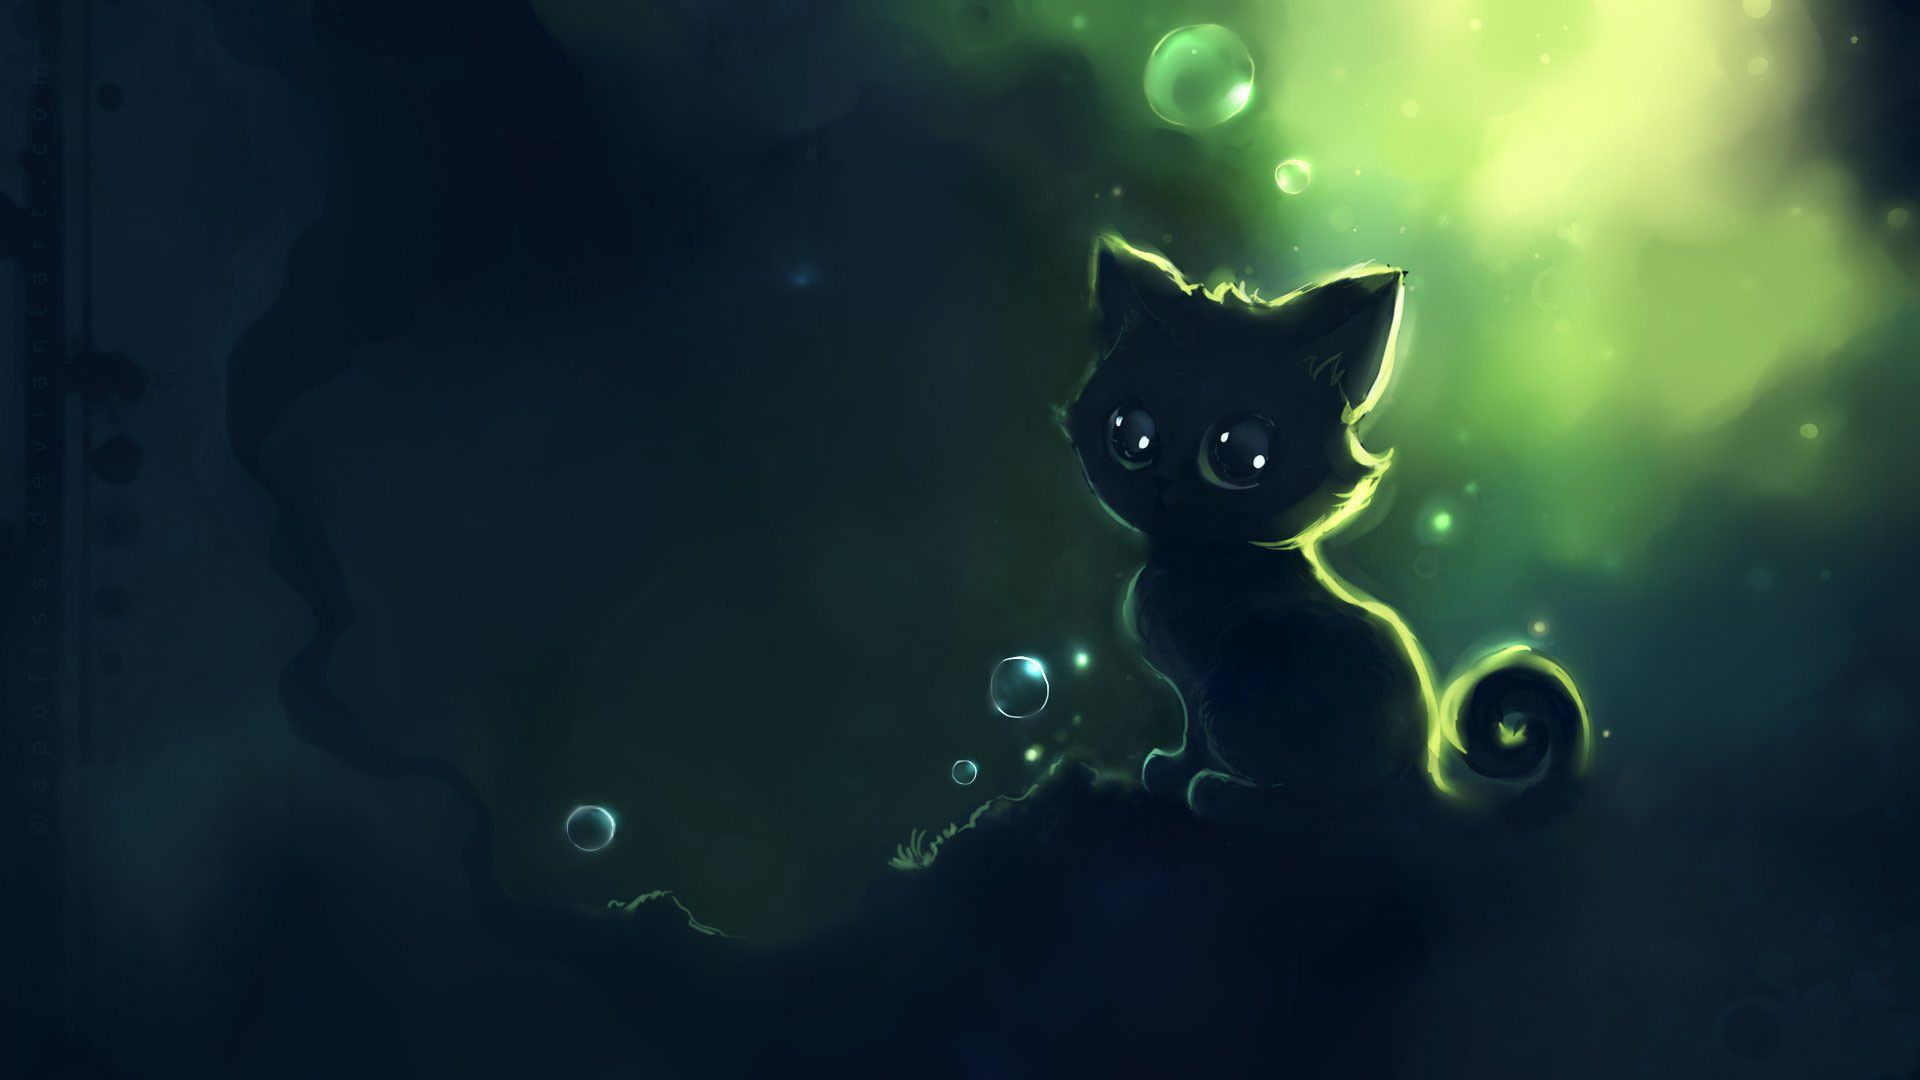 Cute Black Cat Cartoon Wallpapers Top Free Cute Black Cat Cartoon Backgrounds Wallpaperaccess